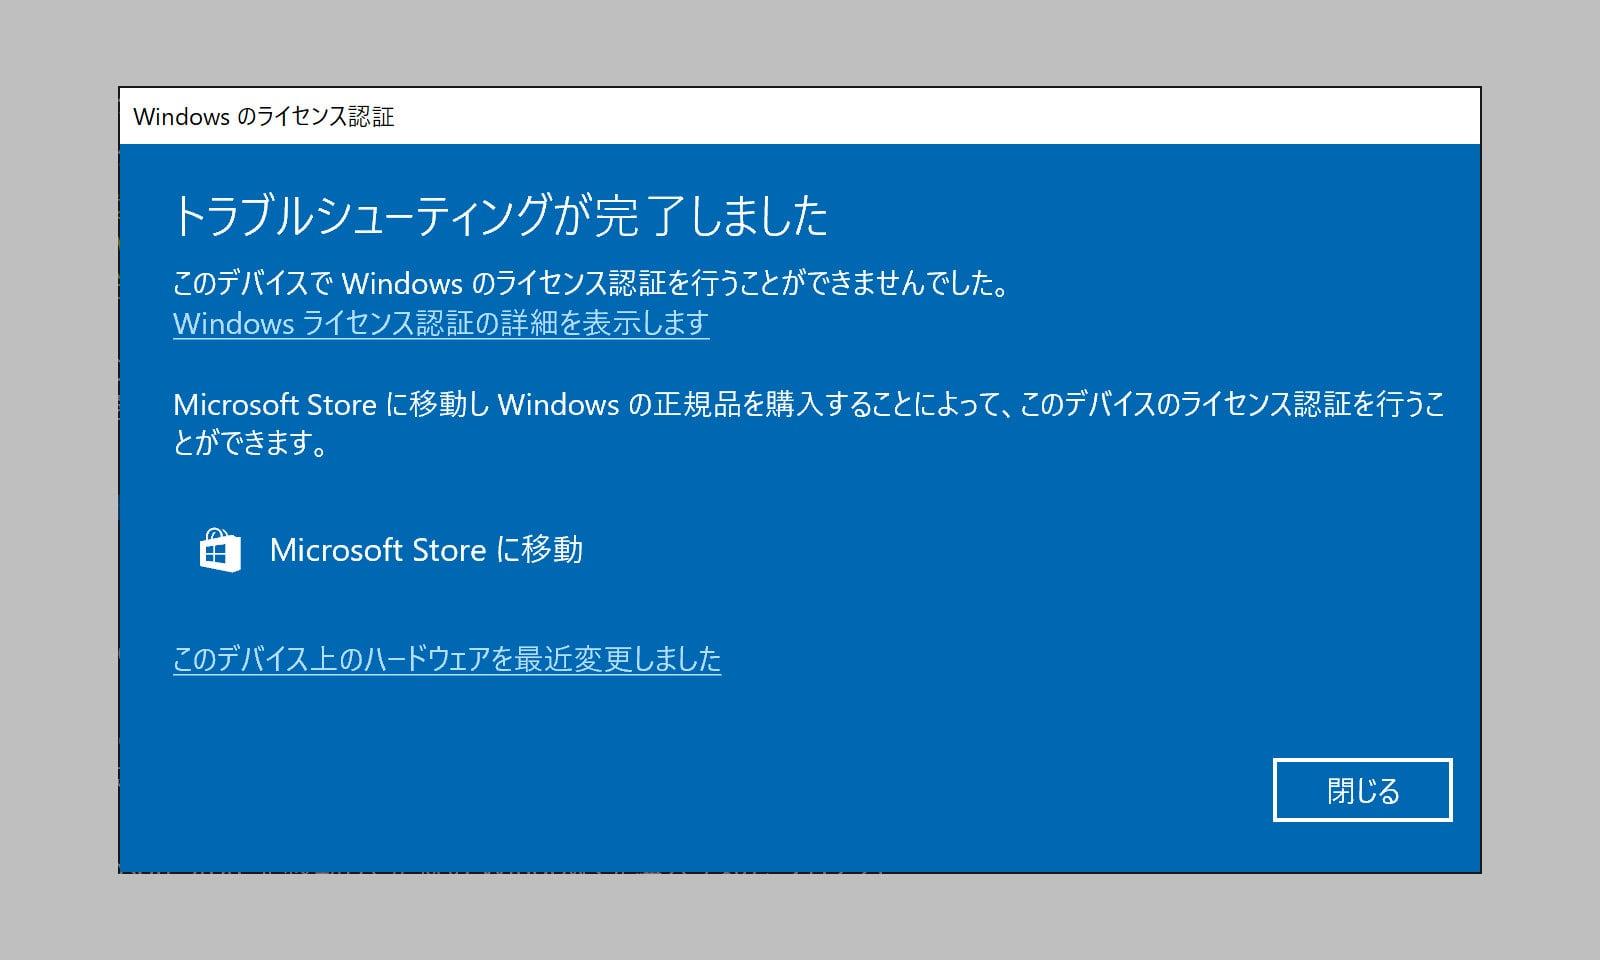 Windowsのライセンス認証の画面キャプチャ。「トラブルシューティングが完了しました」と表示されていて下に「このデバイス上のハードウェアを最近変更しました」というリンクがある